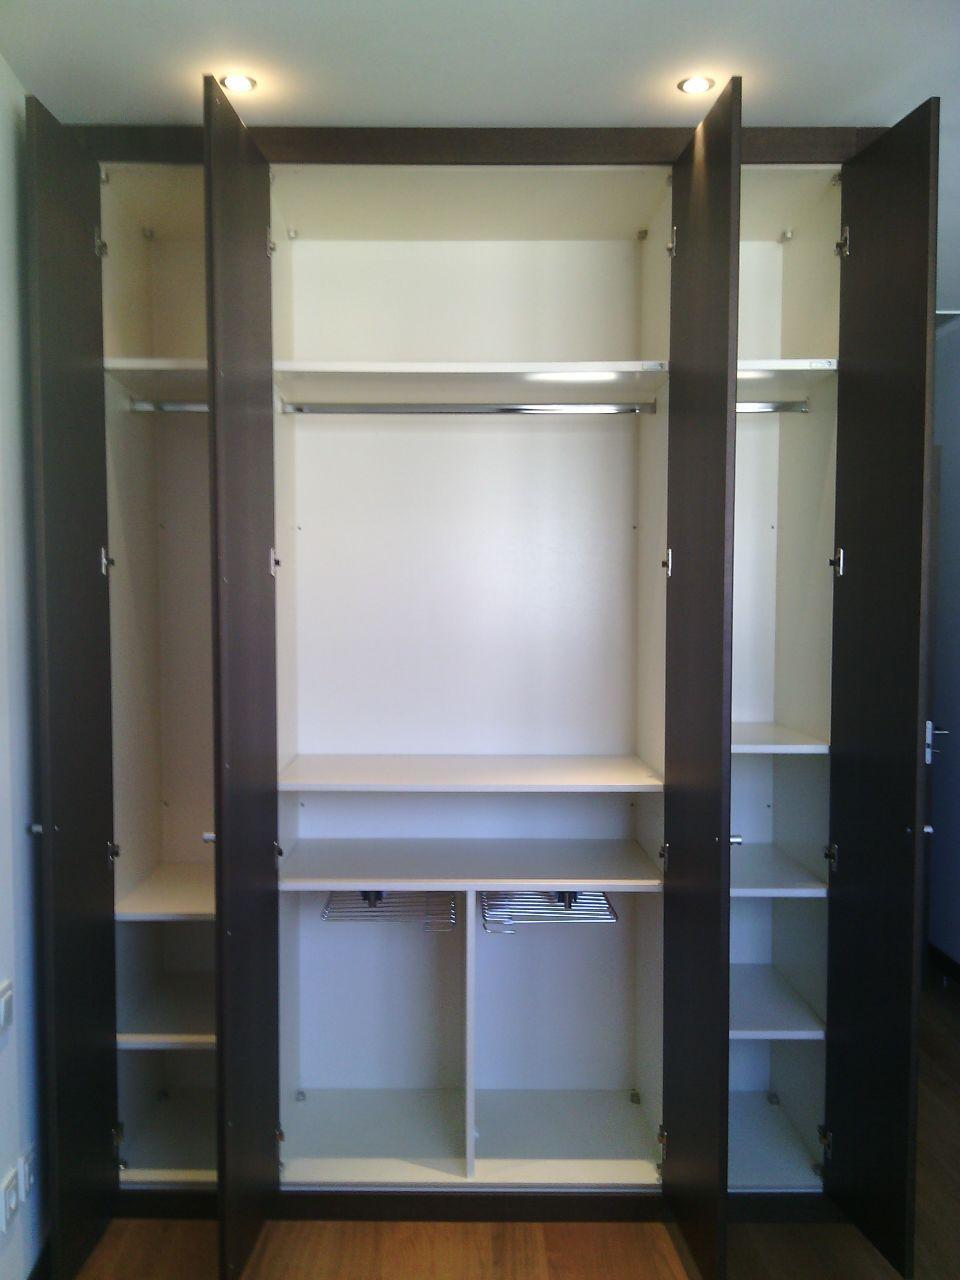 Interiores de armario con baldas lacadas seg n color - Armario con baldas ...